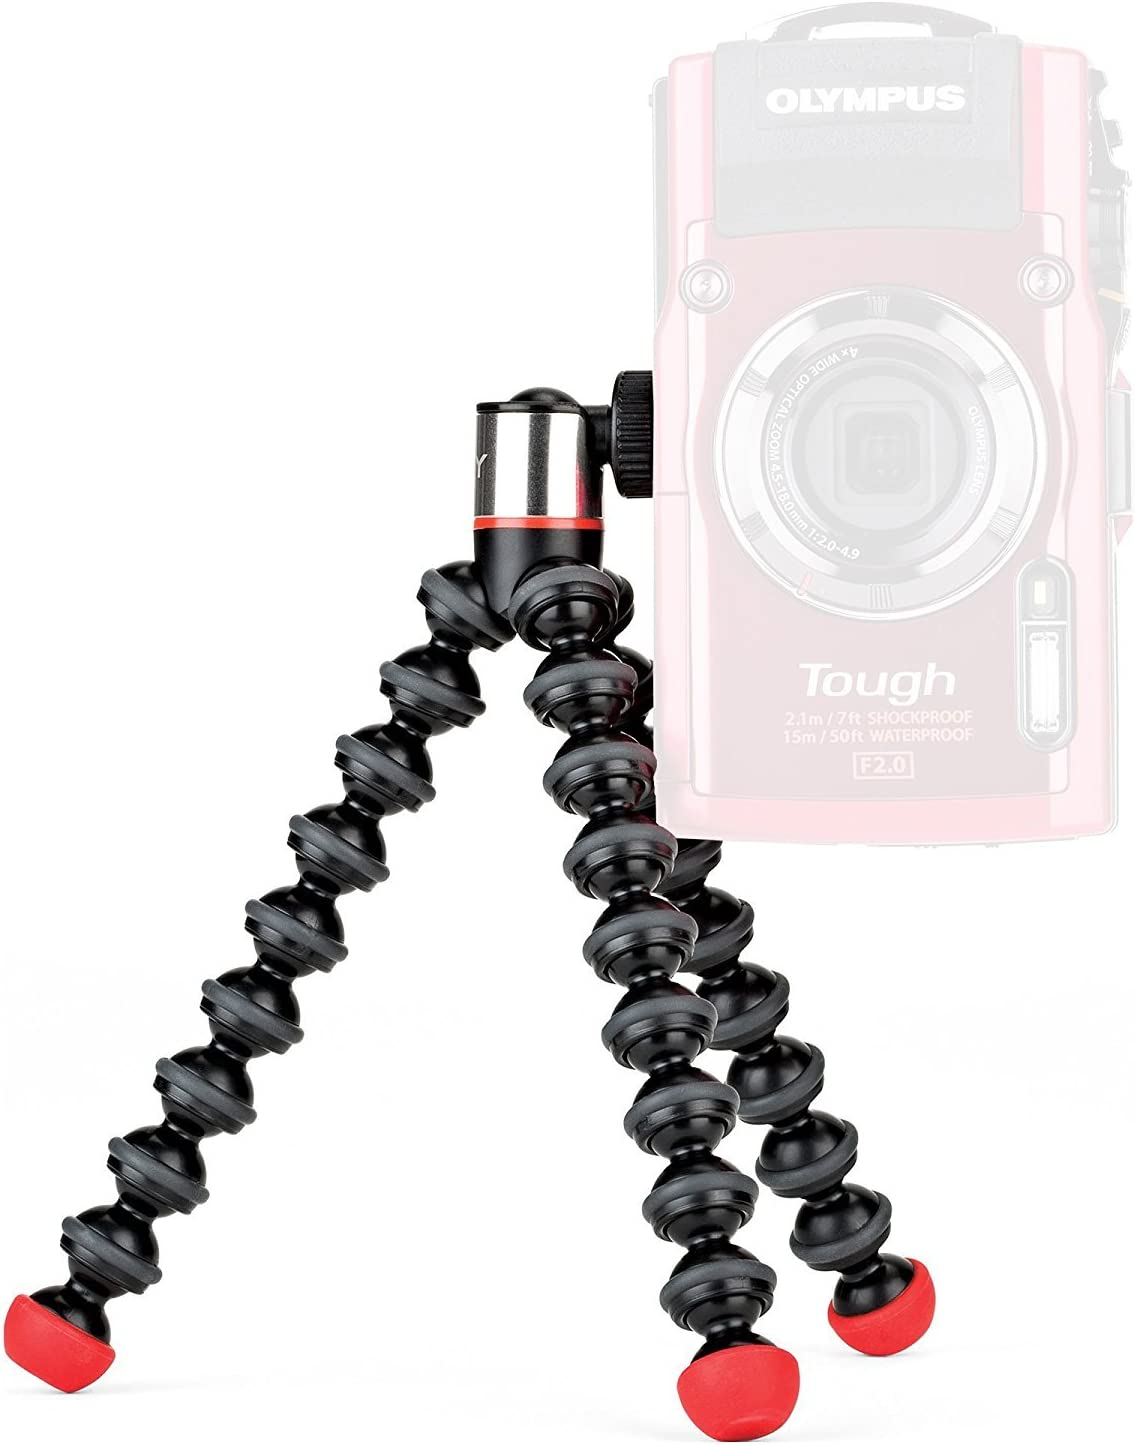 Max 87% OFF Joby GorillaPod Magnetic Selling rankings 325 Flexible A Bonus Mini-Tripod with